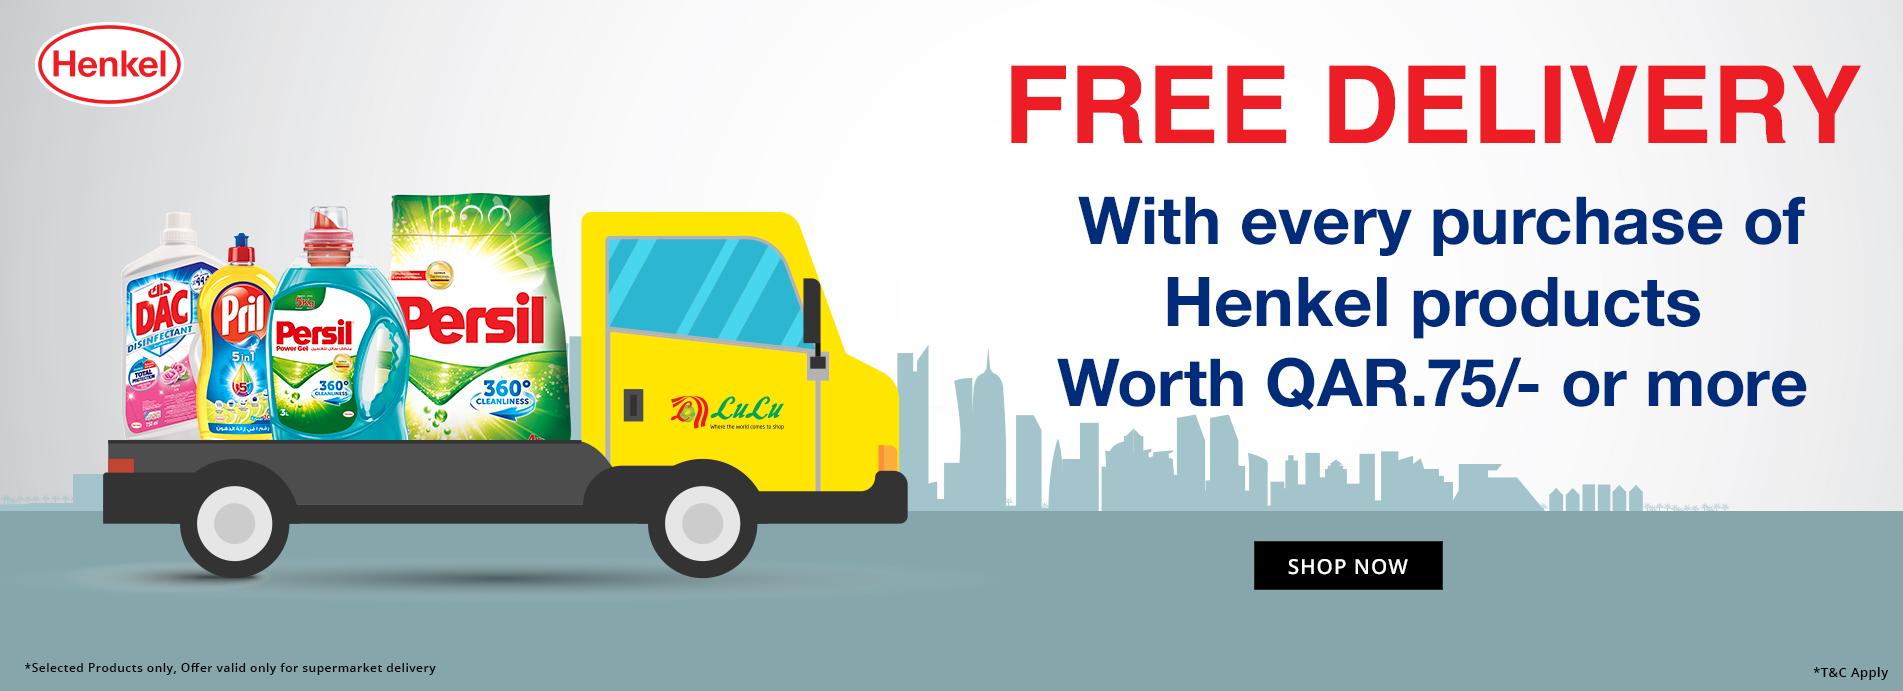 LuLu Hypermarket Qatar: Best deals & offers on Groceries